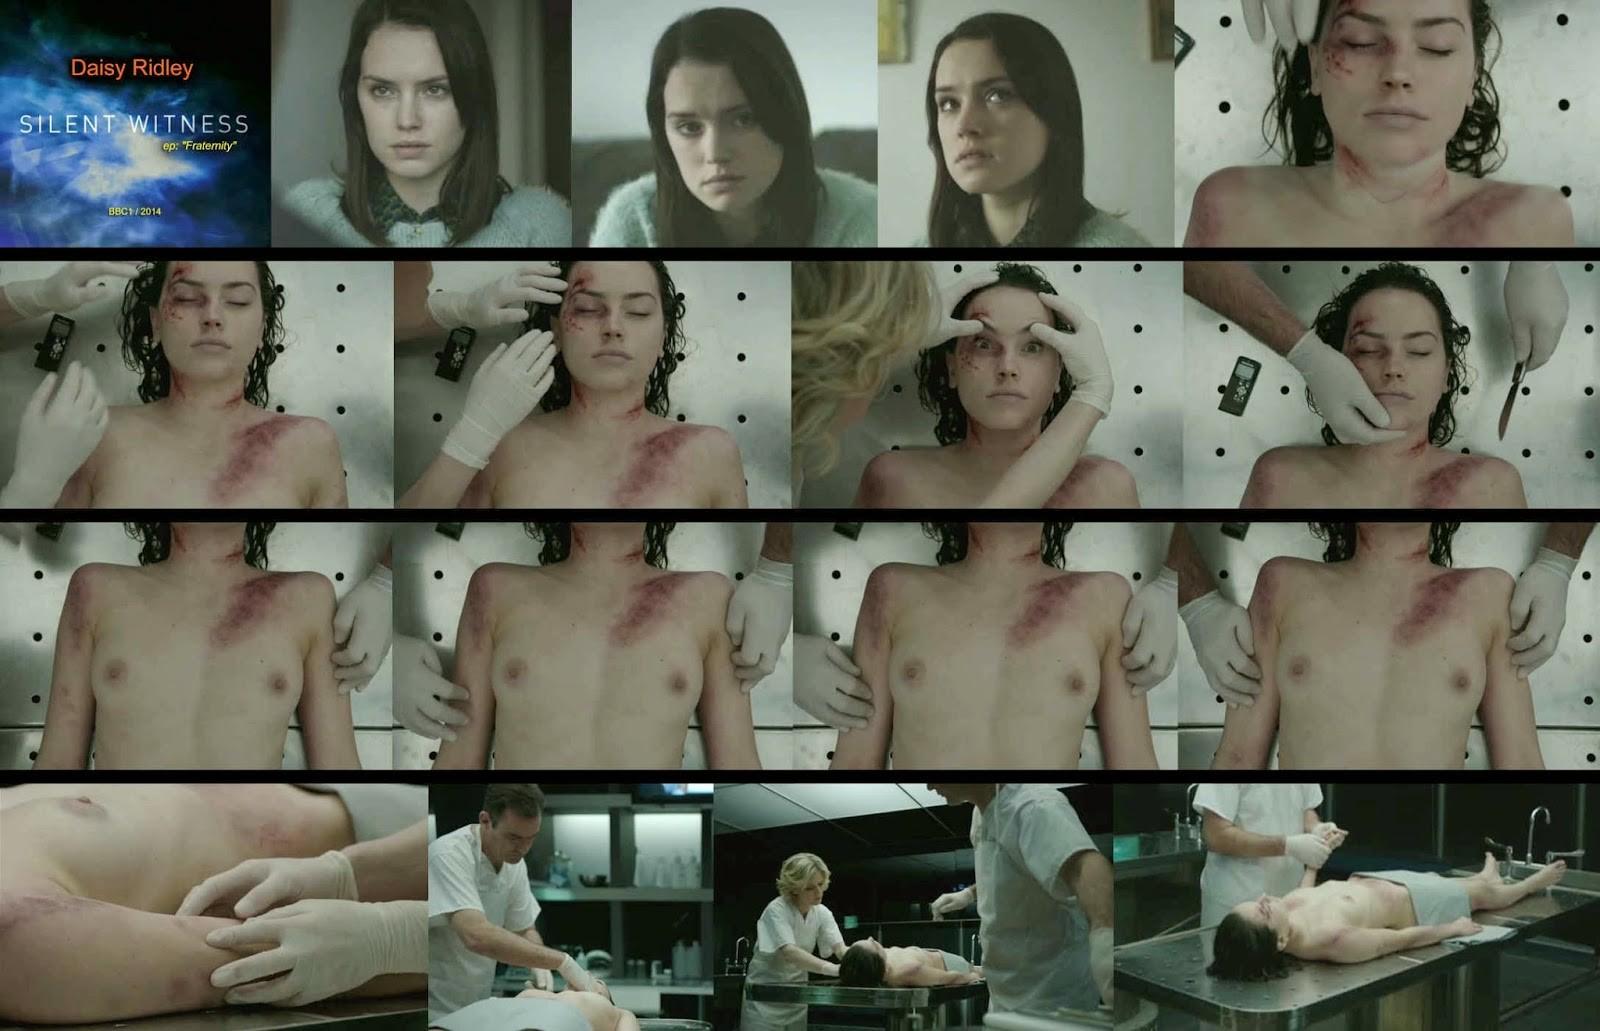 Daisy Ridley Desnuda Fotos Y Vídeos Imperiodefamosas